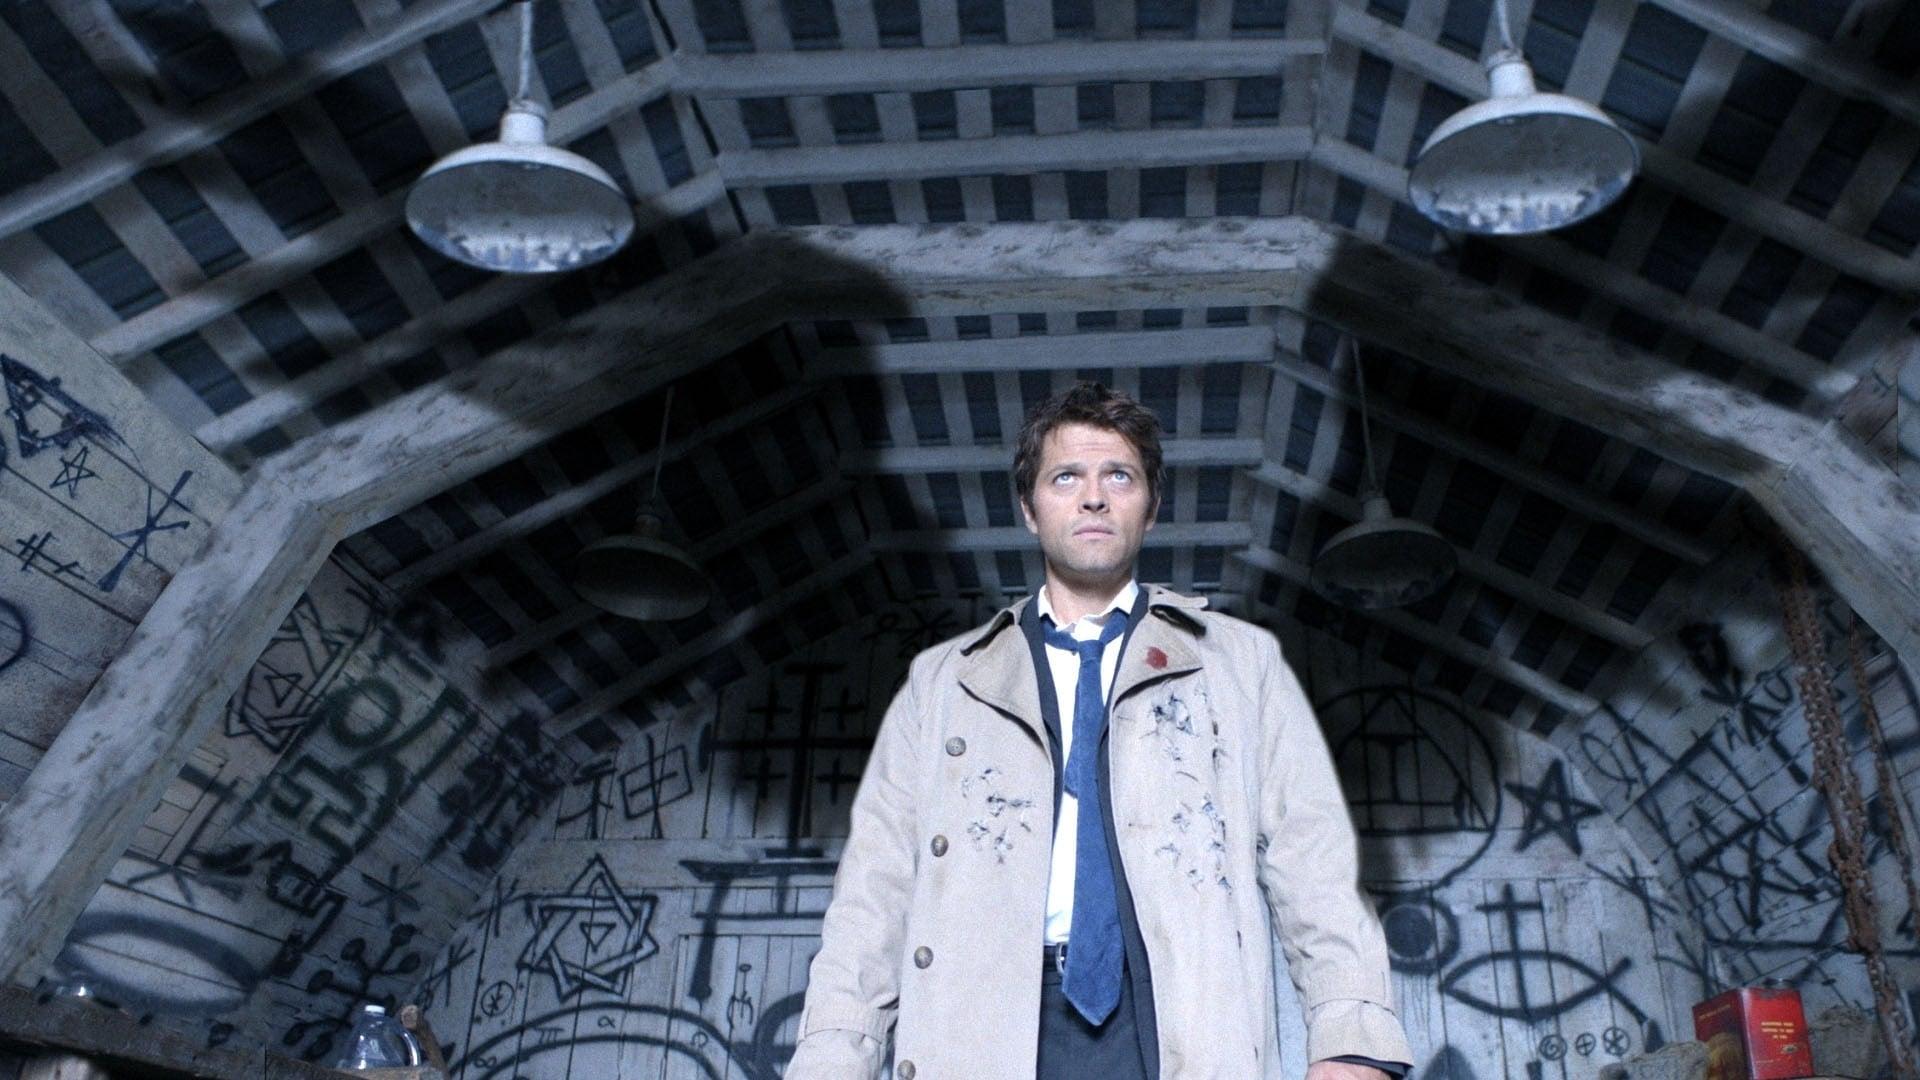 Supernatural - Season 4 Episode 19 Jump the Shark